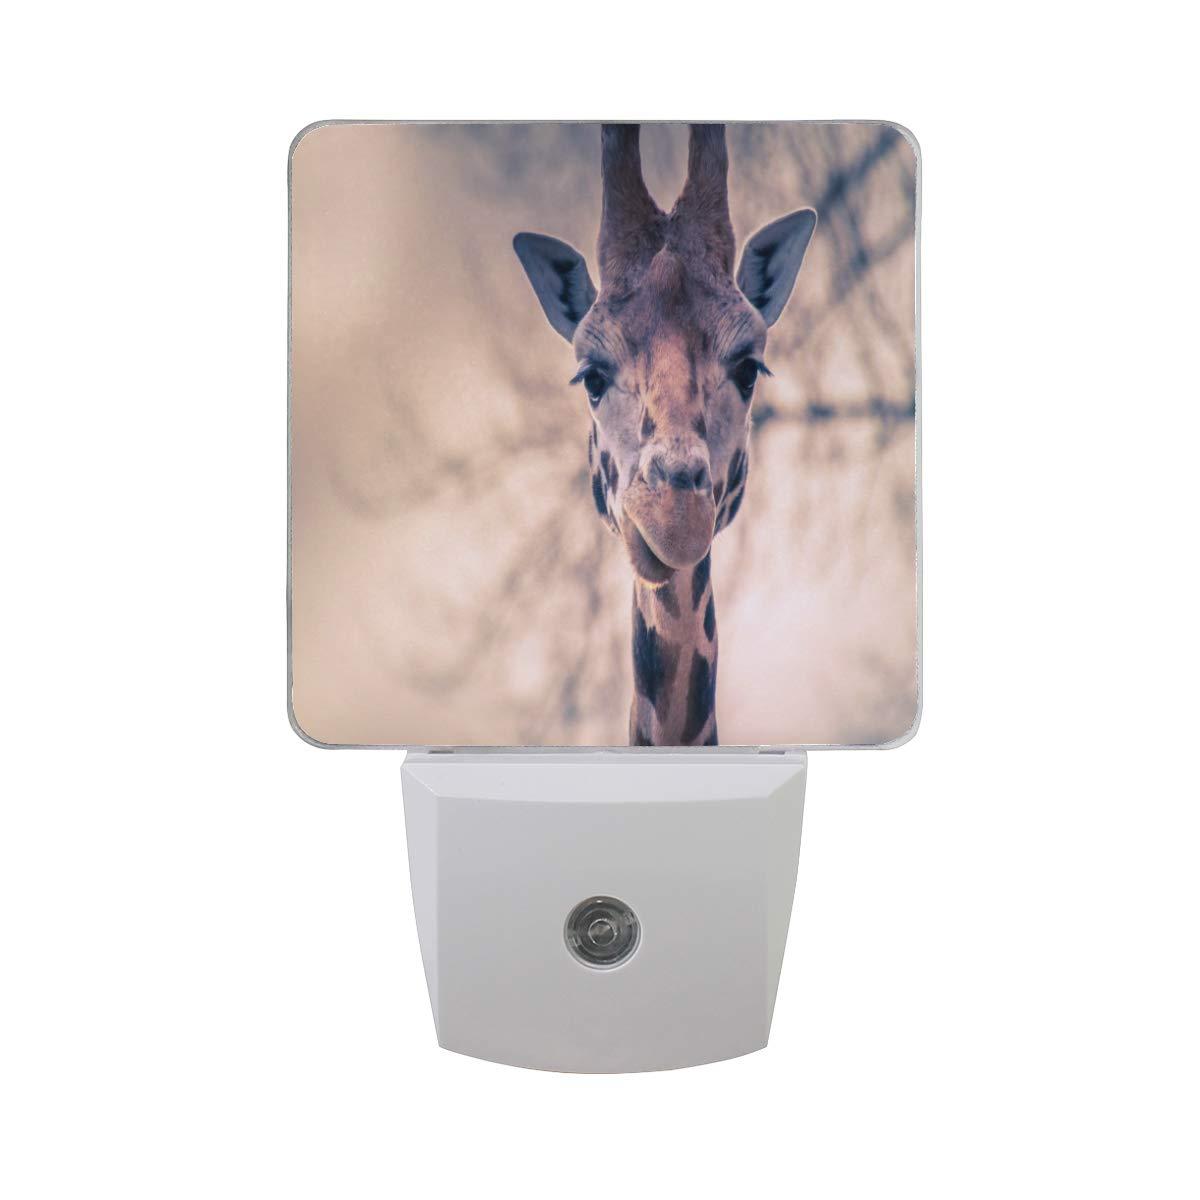 Linomo LED Night Light Lamp Cute Giraffe Face Auto Senor Nightlight Plug in for Kids Adults Boys Girls Bedroom Decor, 2 Pack